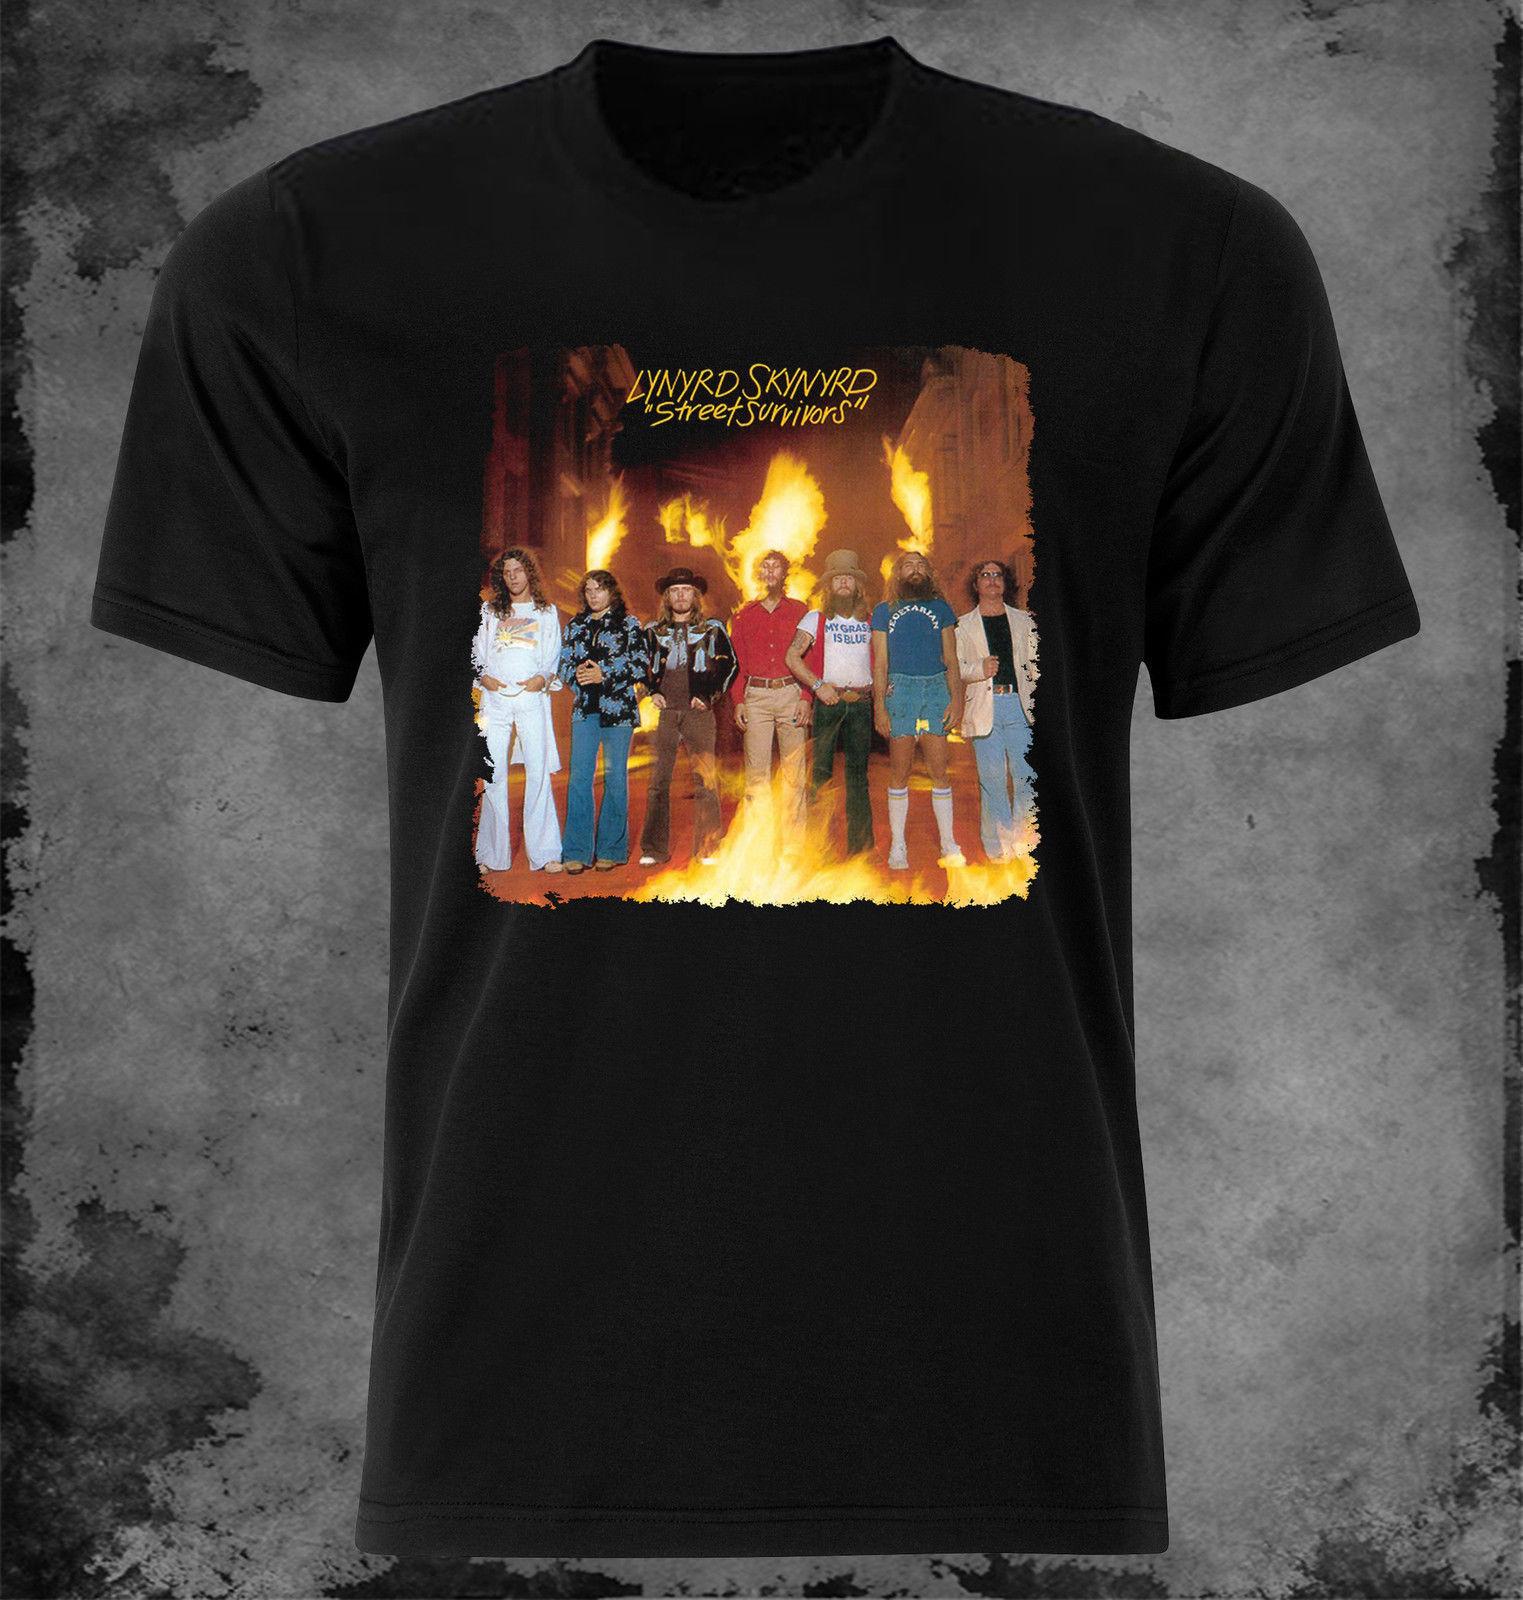 Official Lynyrd Skynyrd Crossed Guitars Unisex T-Shirt Nuthin Fancy Band Wings